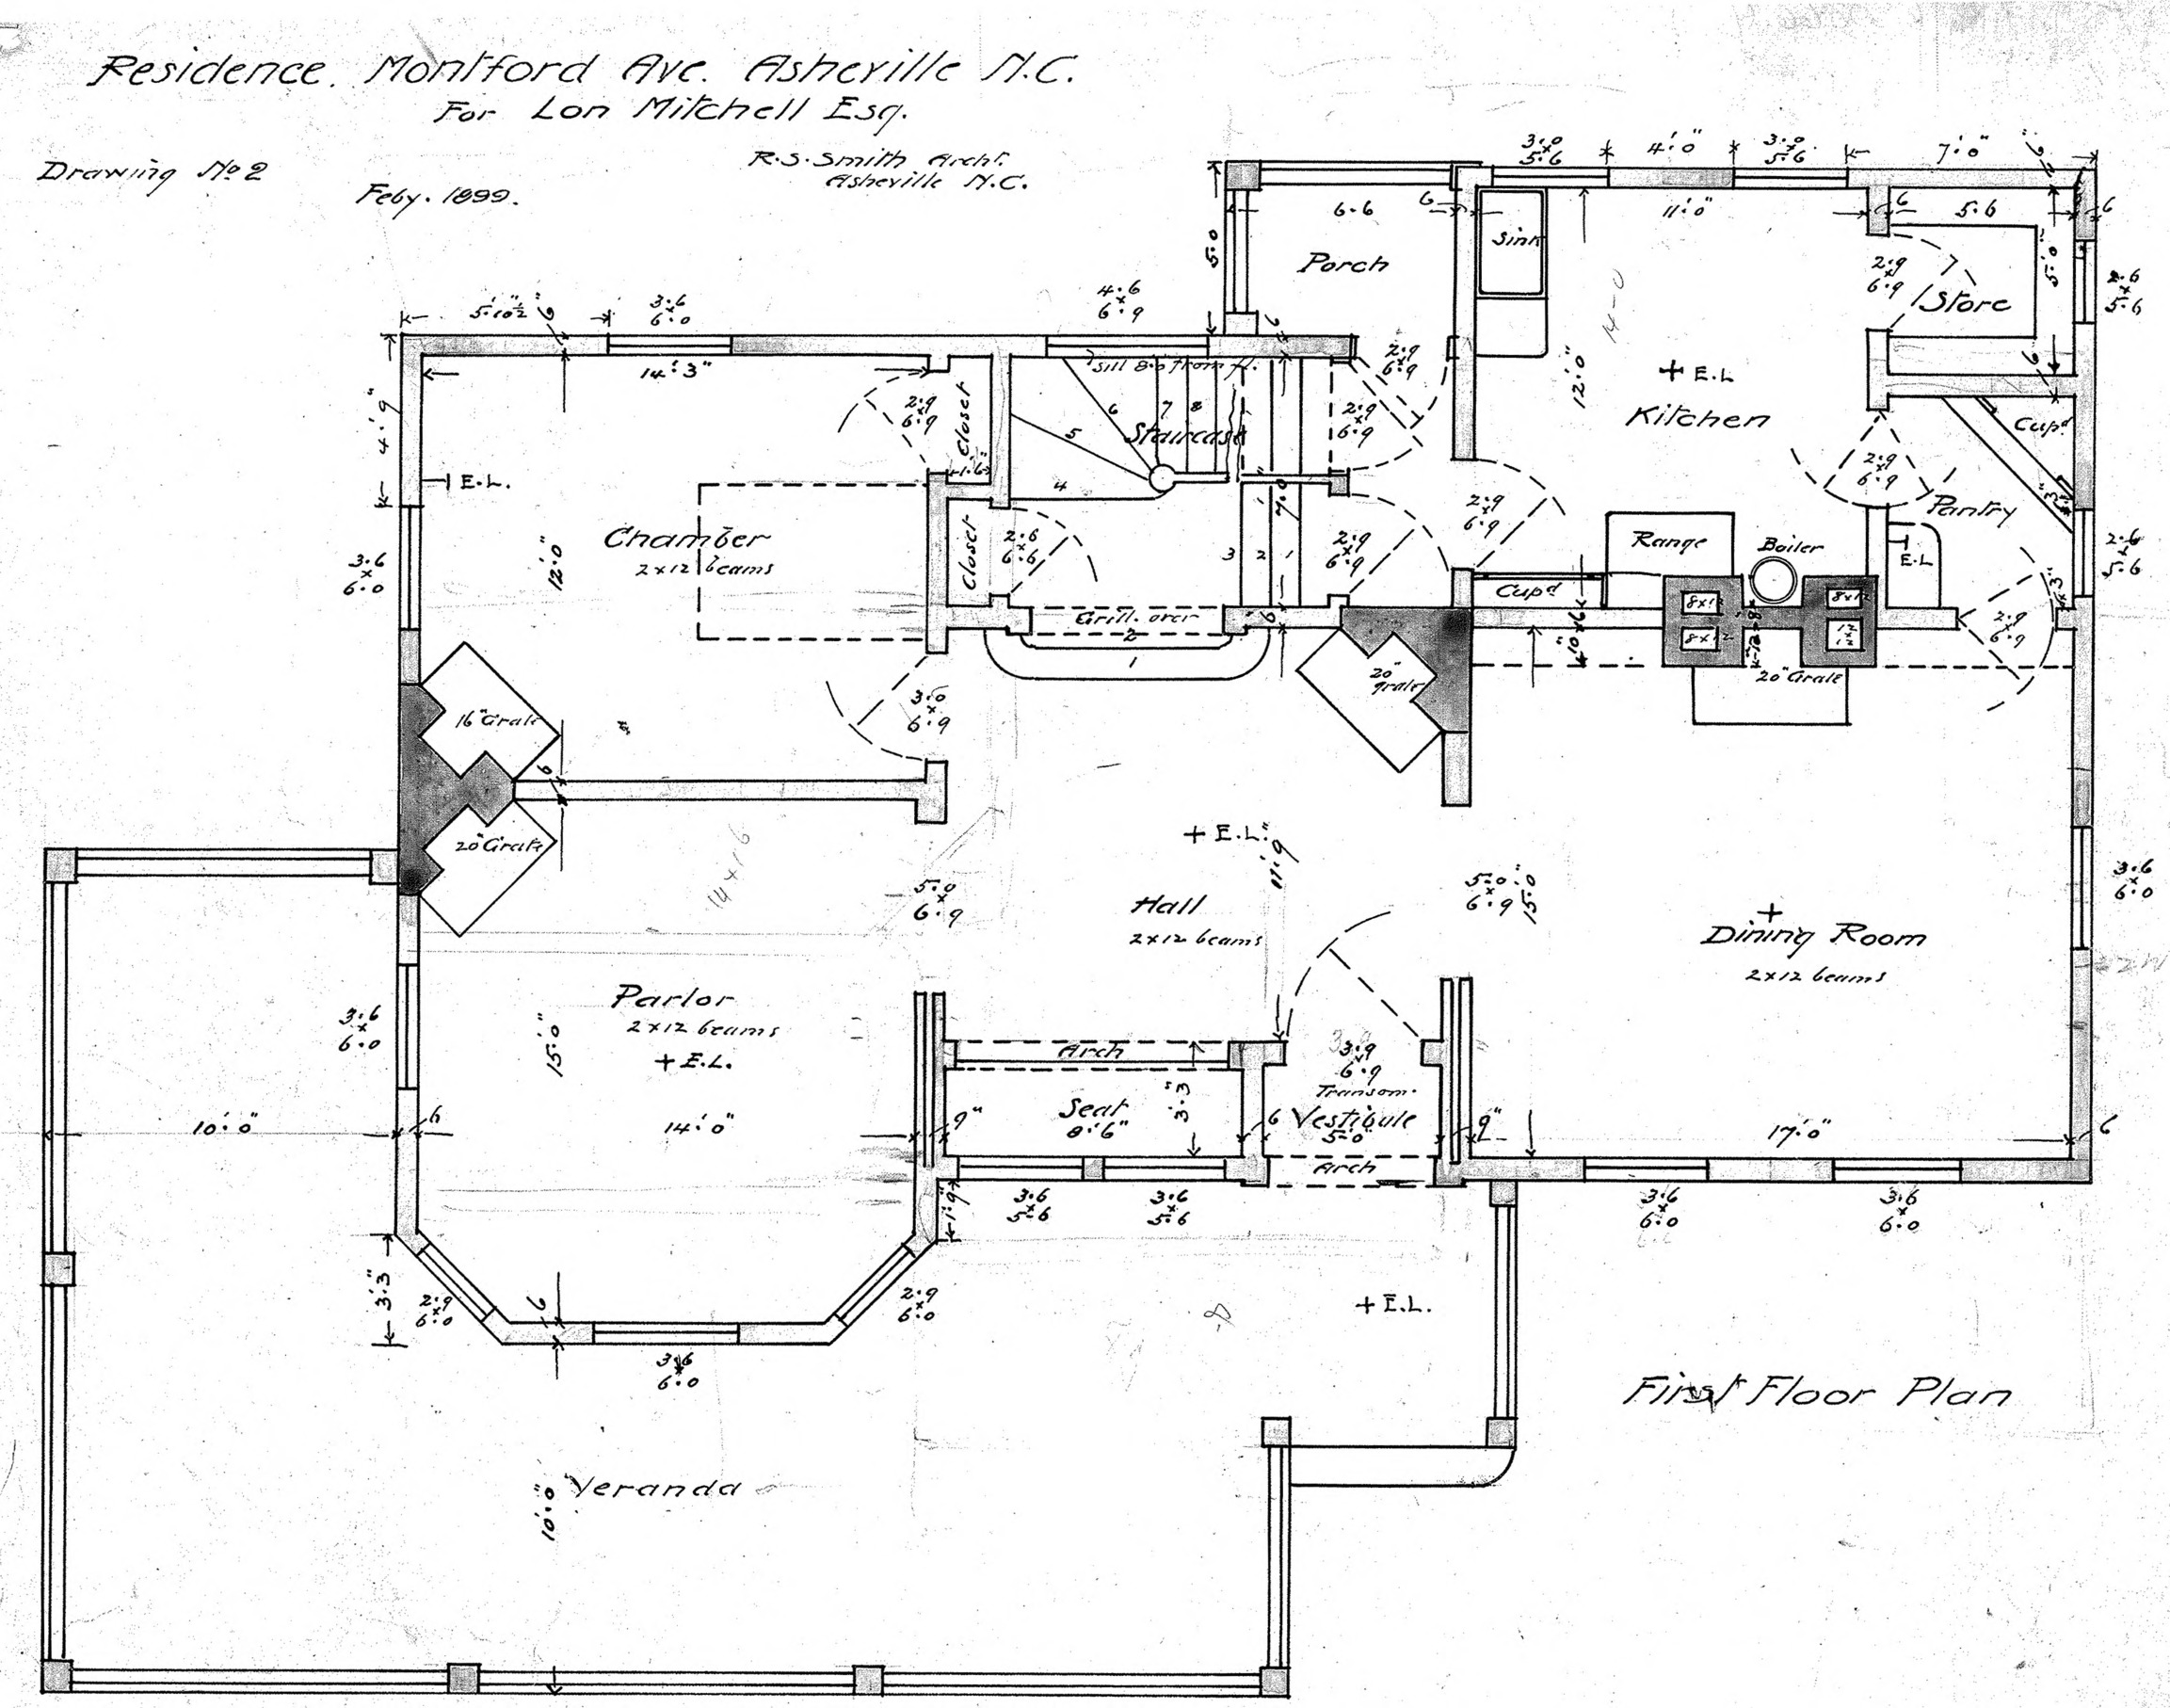 Floorplan Drawer. First Floor Plan rchitecture Drawing Pyramid ... - ^